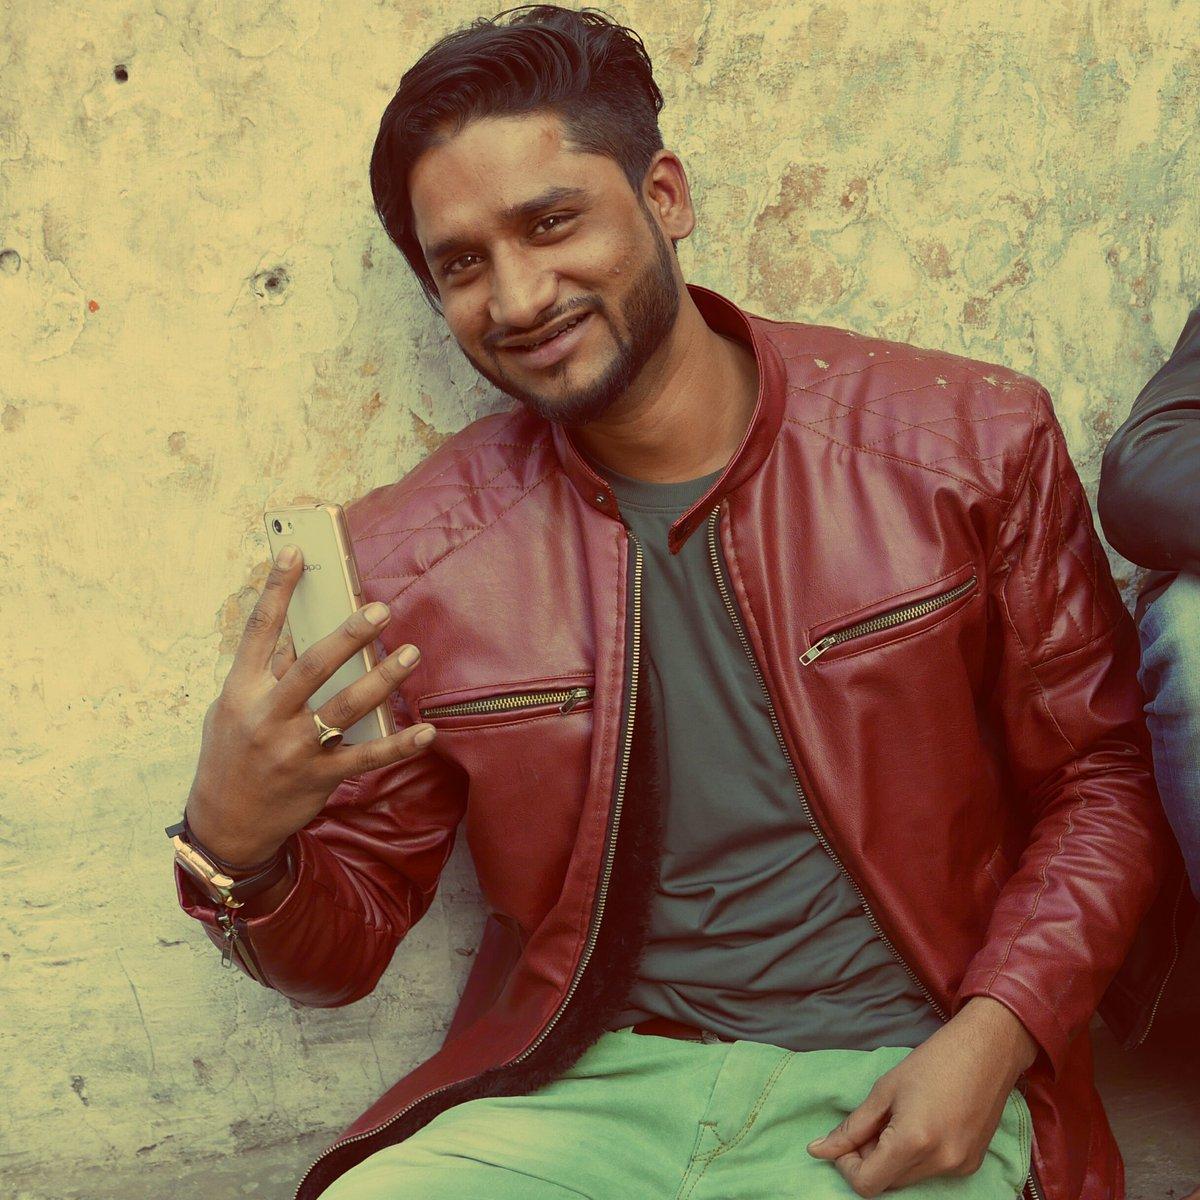 J&#39;ai croisé Cyril Hanouna à Jaipur en Inde!!! #CyrilHanouna #Jaipur #Inde #Rajasthan #voyage #travel <br>http://pic.twitter.com/TmXxMMMrYc